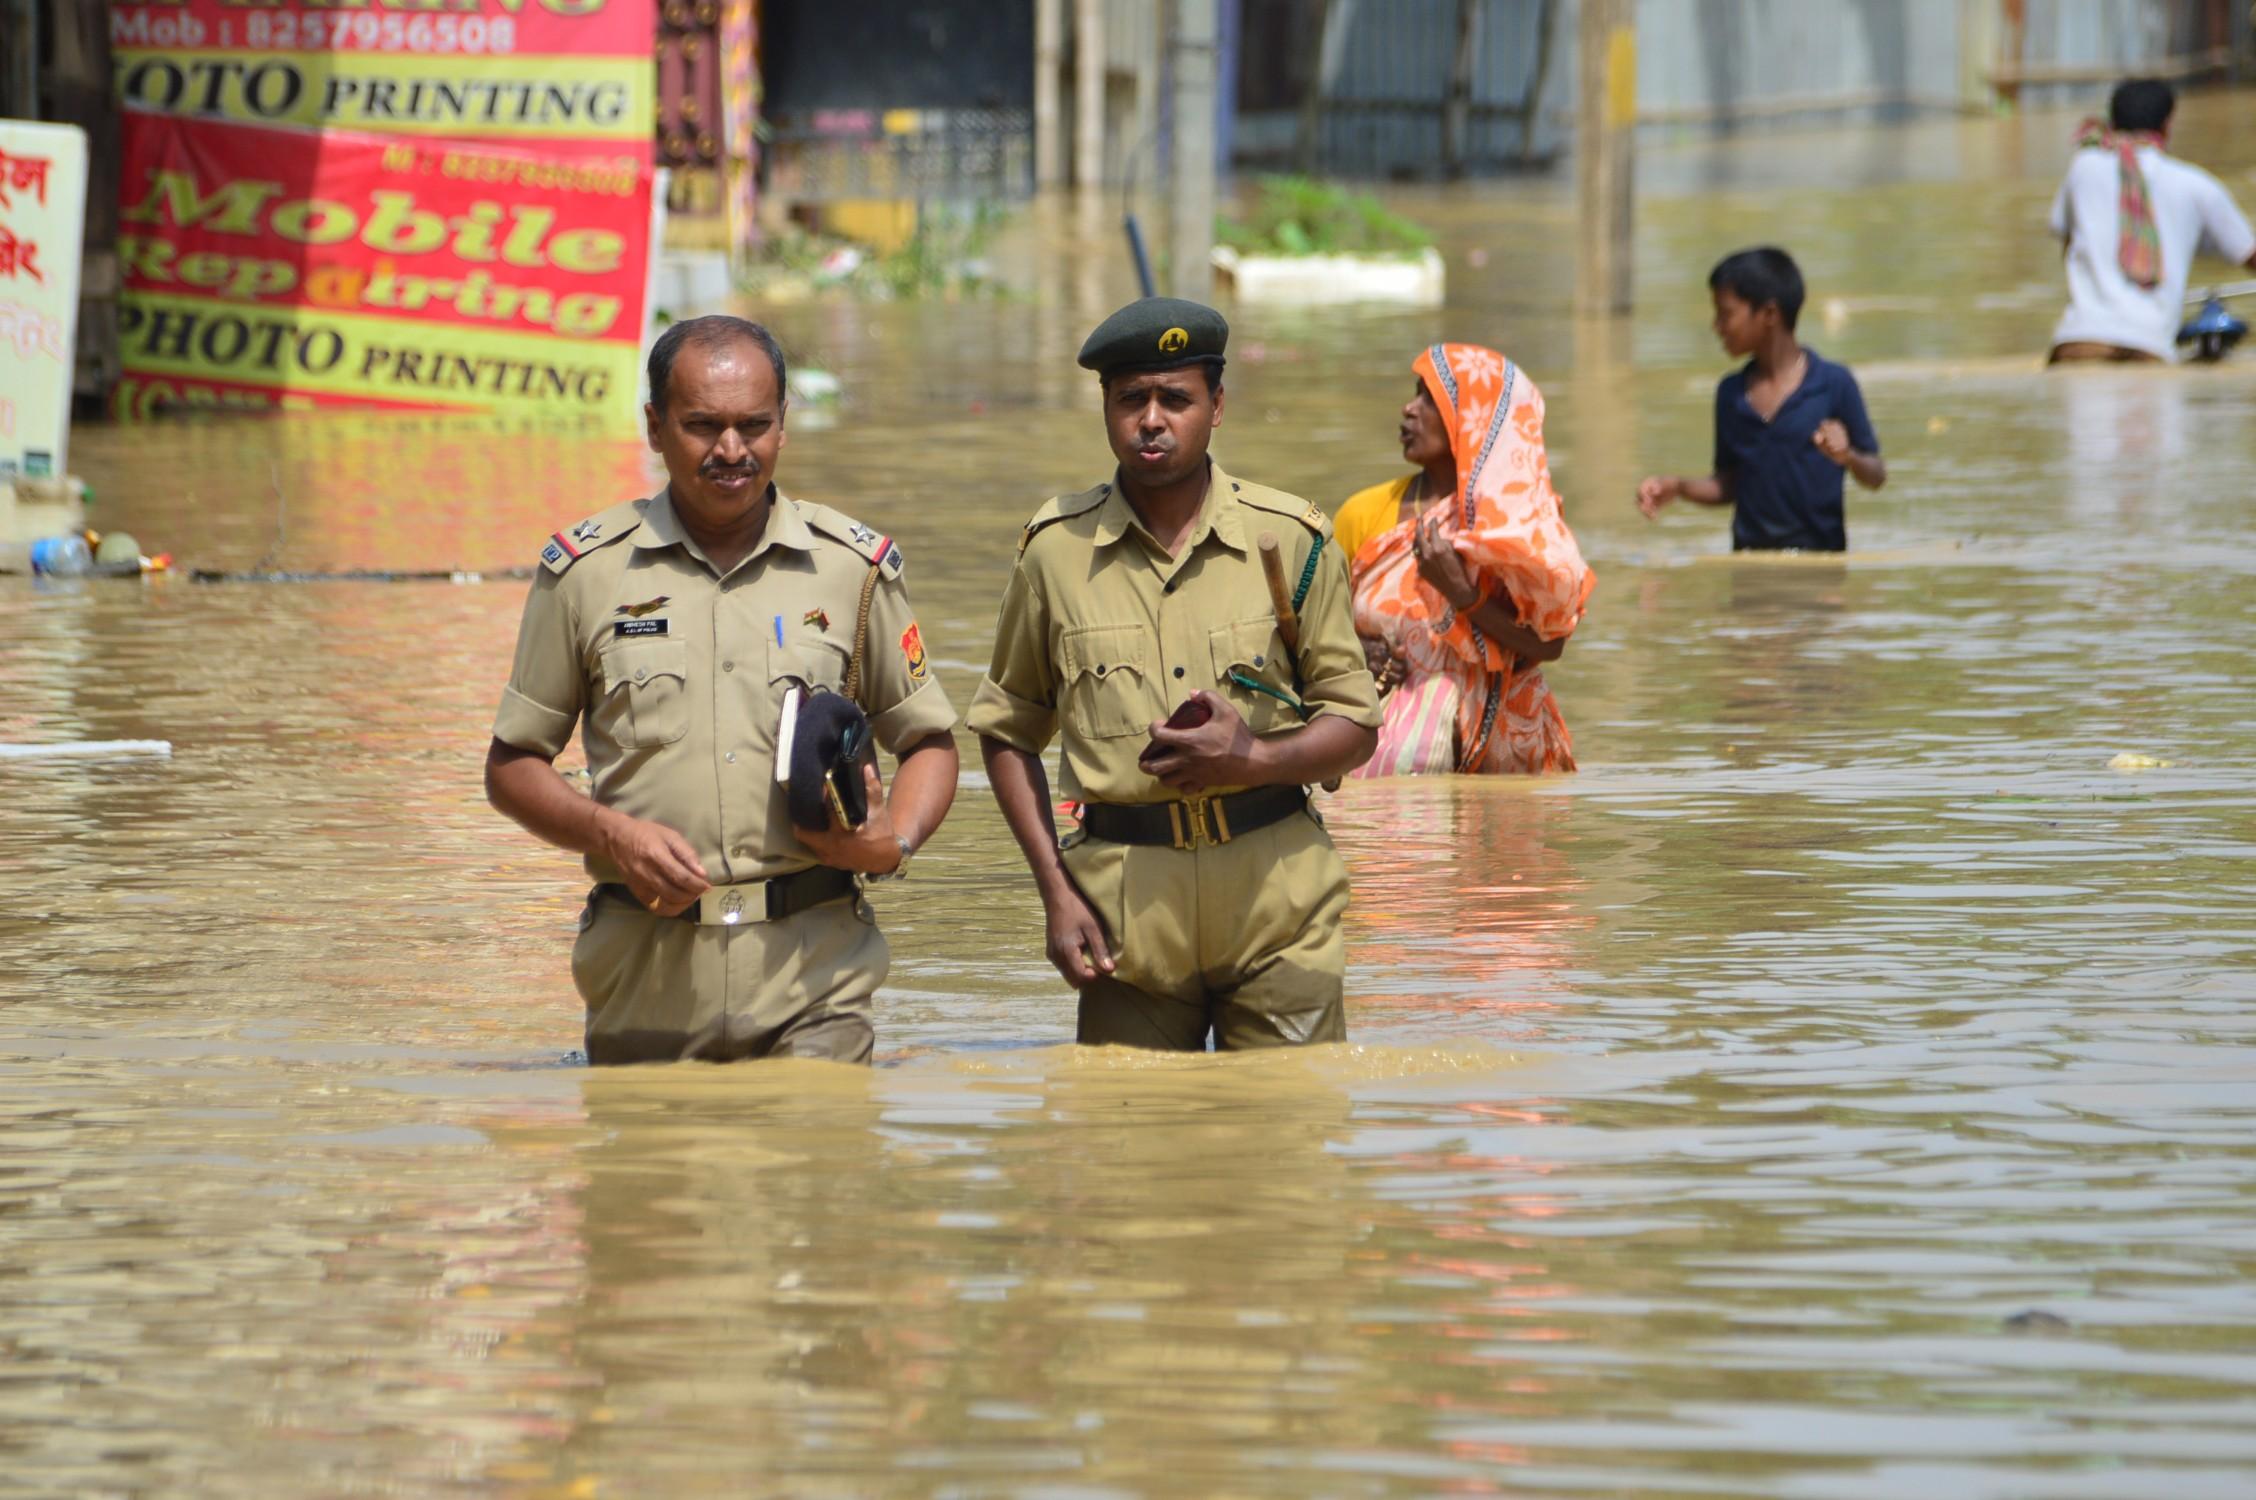 Rescue teams wade through the water. Photo credit: Abhishek Saha